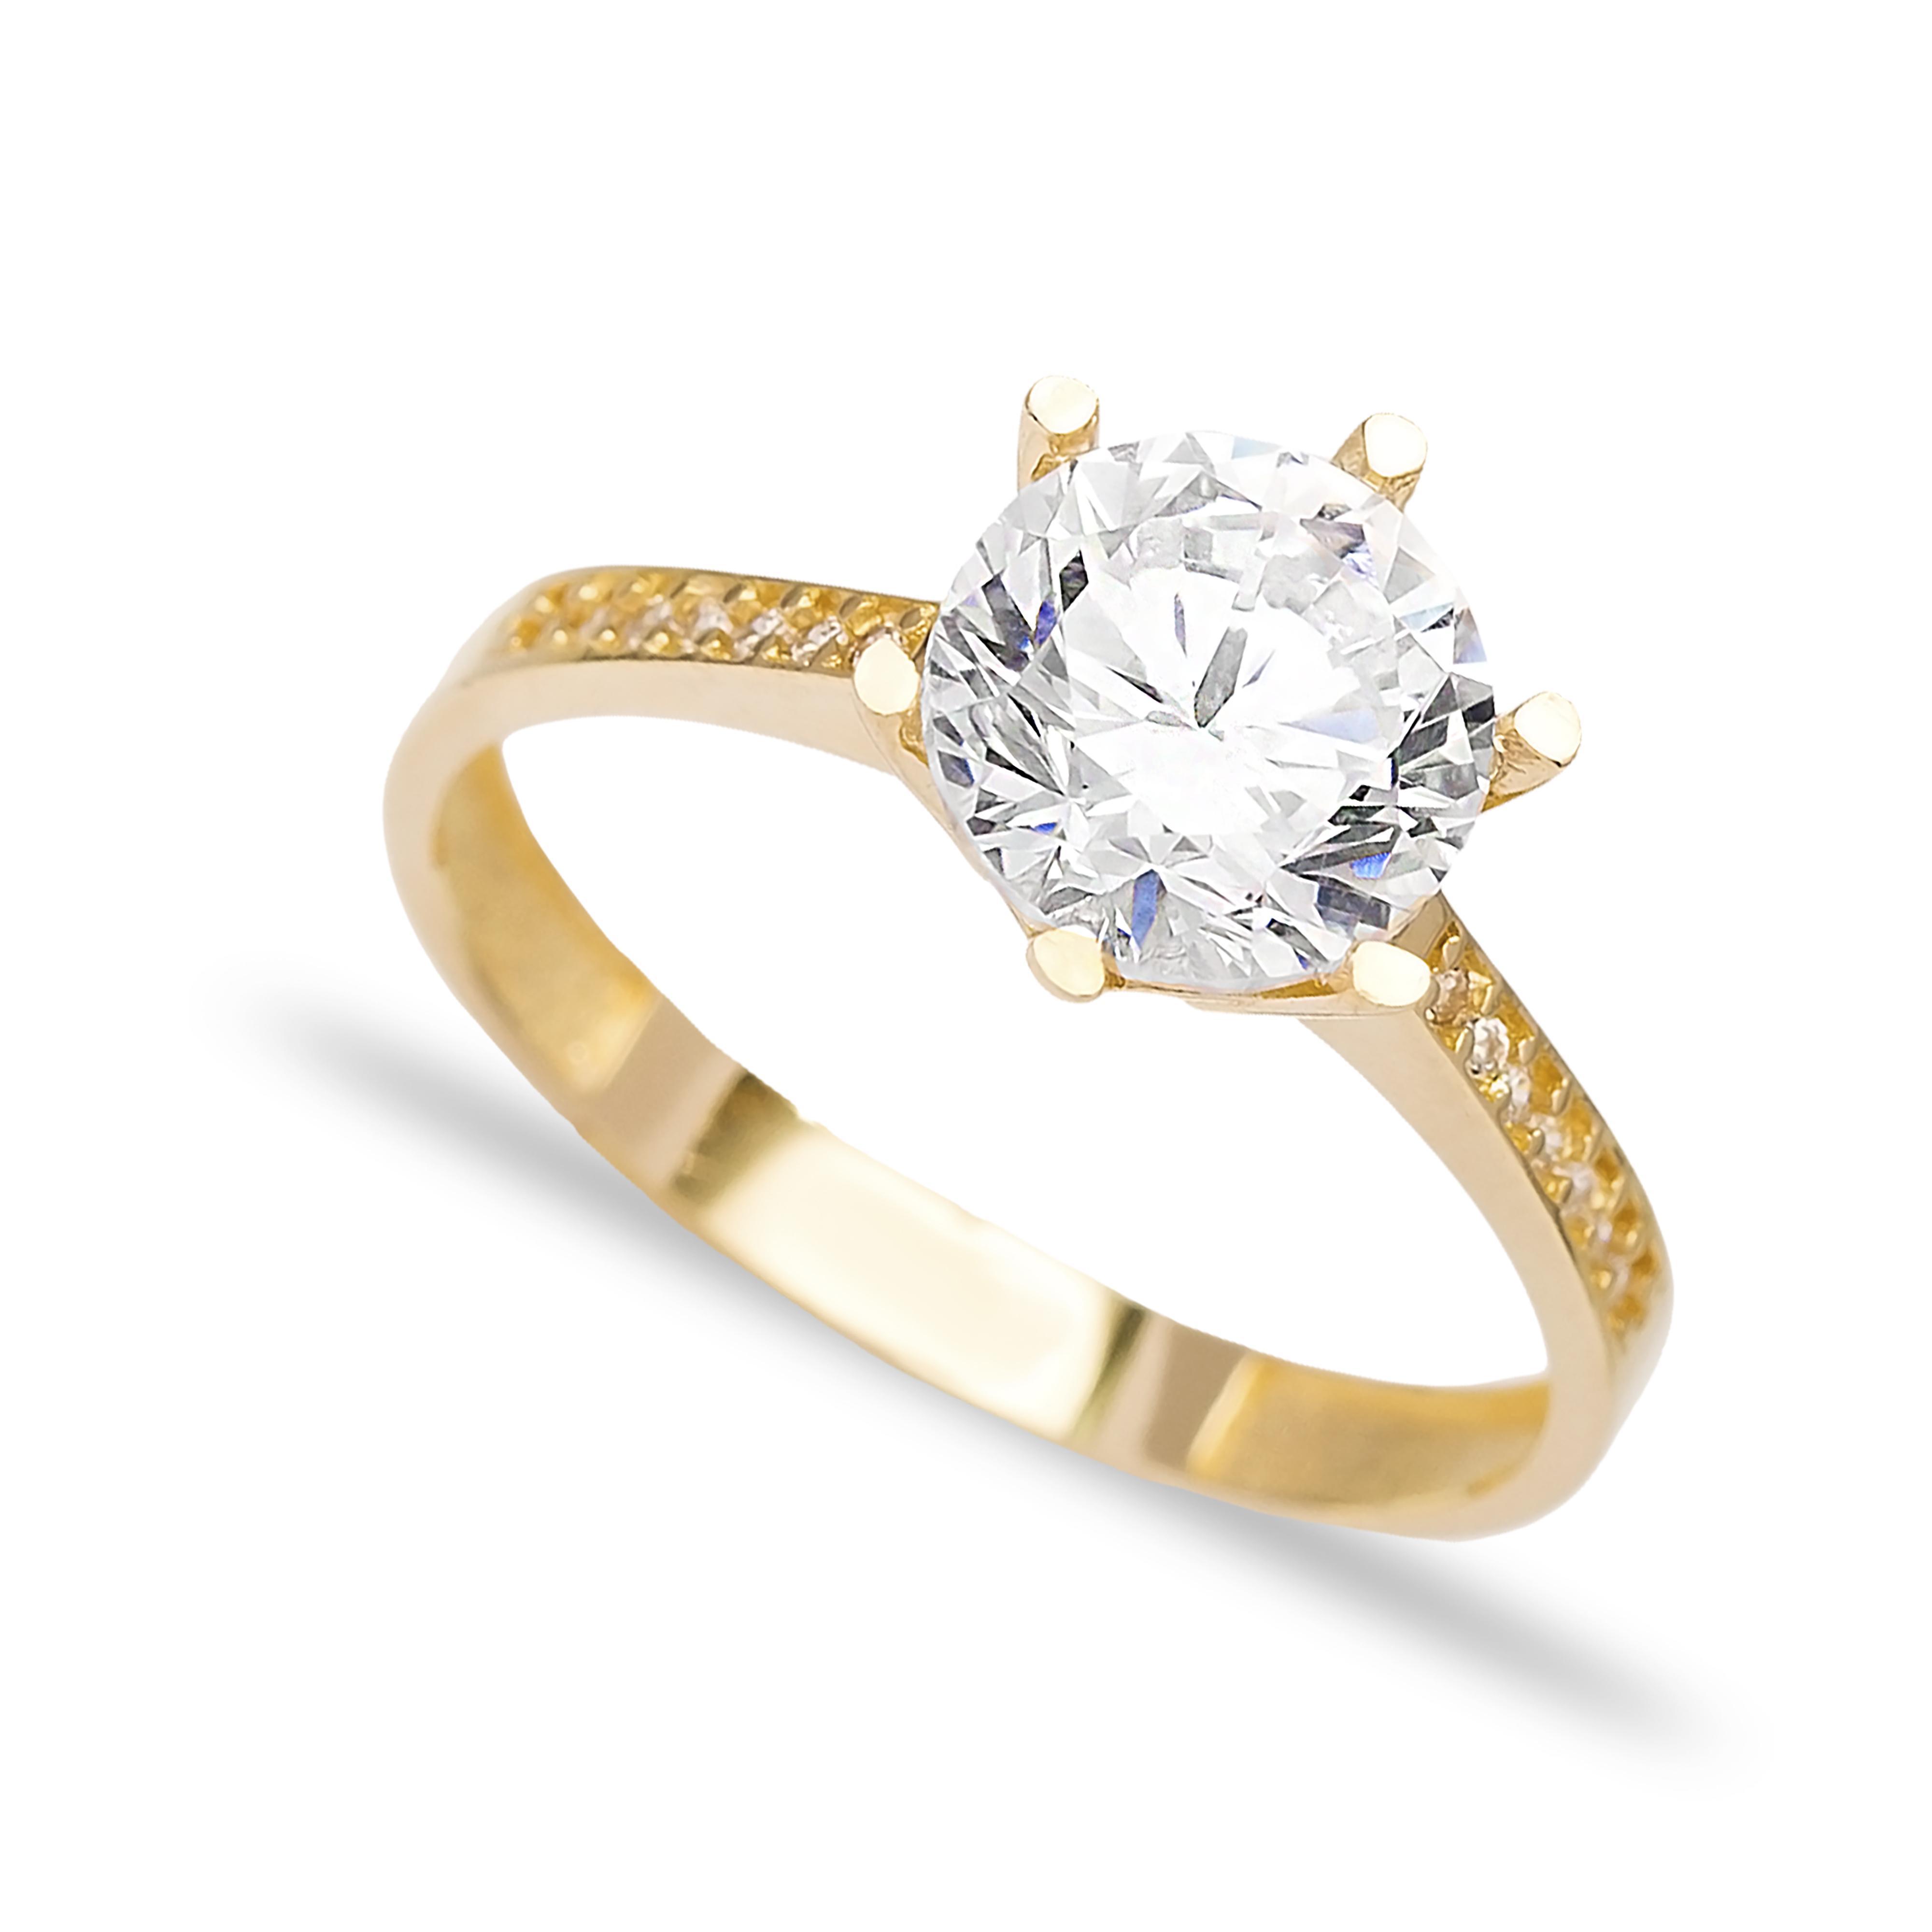 Engagement Solitaire 14 Karat Gold Zirconia 8mm Wholesale Handmade Turkish Jewelry